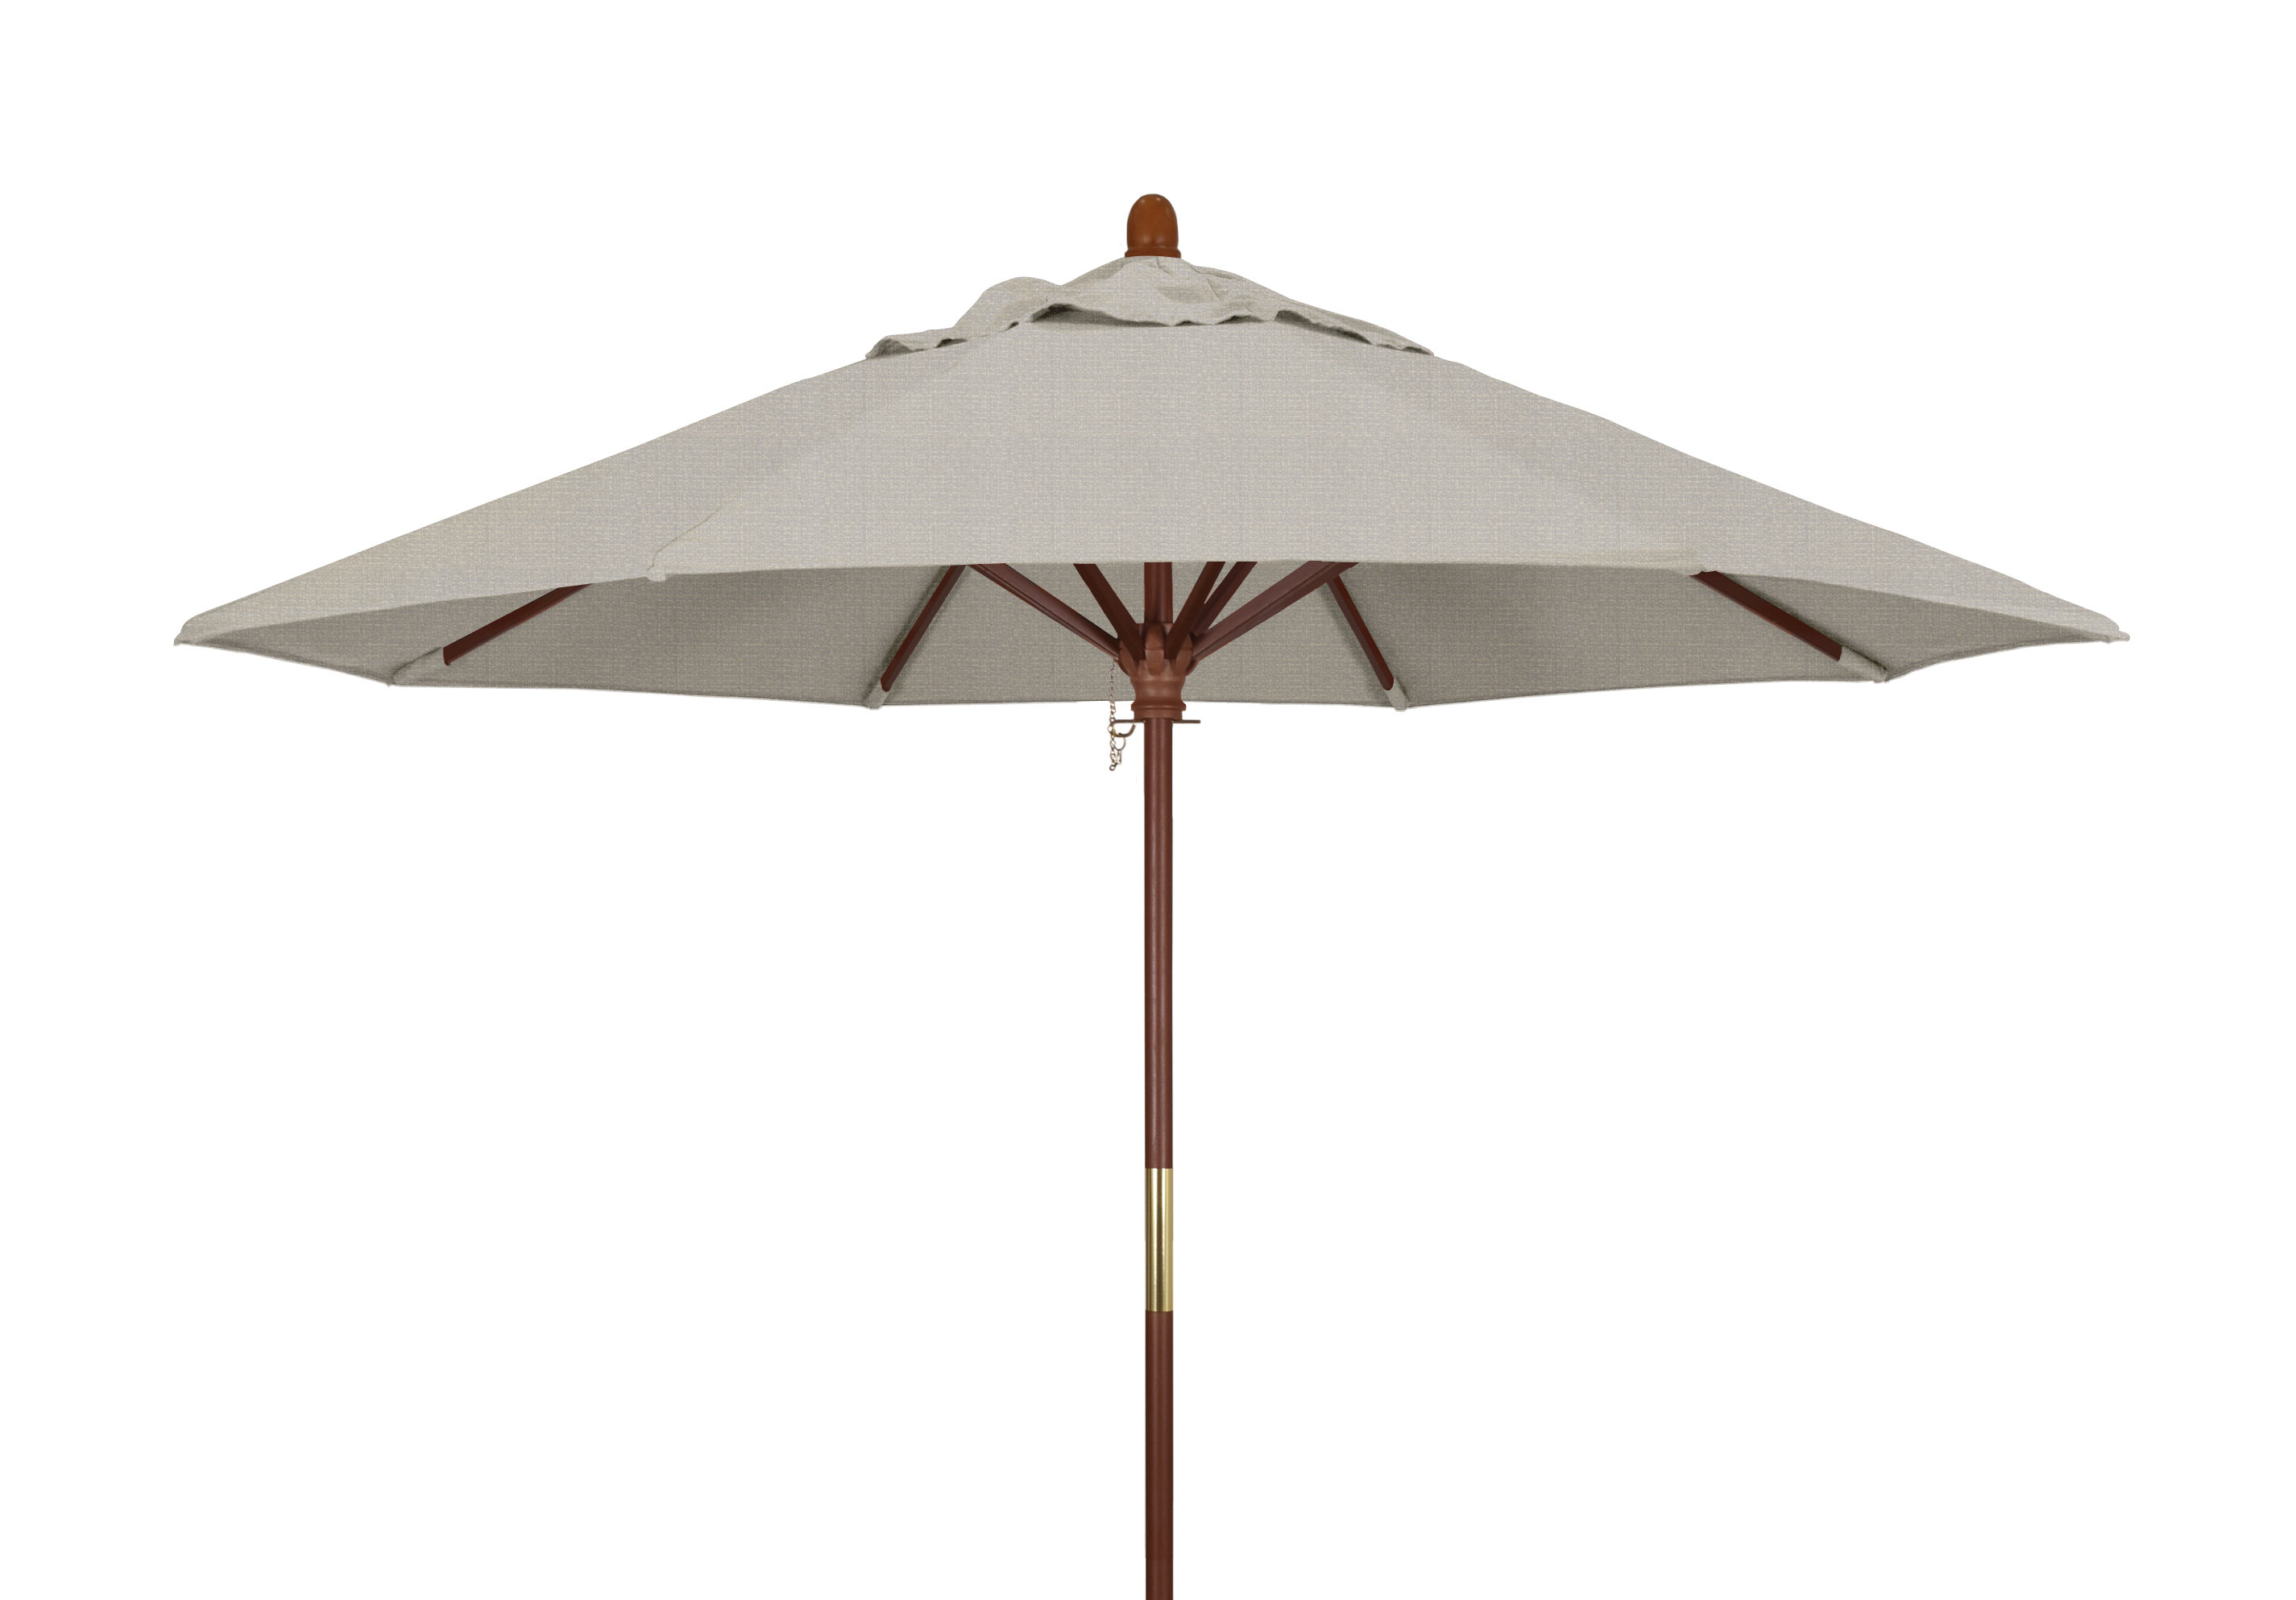 Mraz 9' Market Umbrella With Regard To Newest Mraz Market Umbrellas (View 4 of 20)